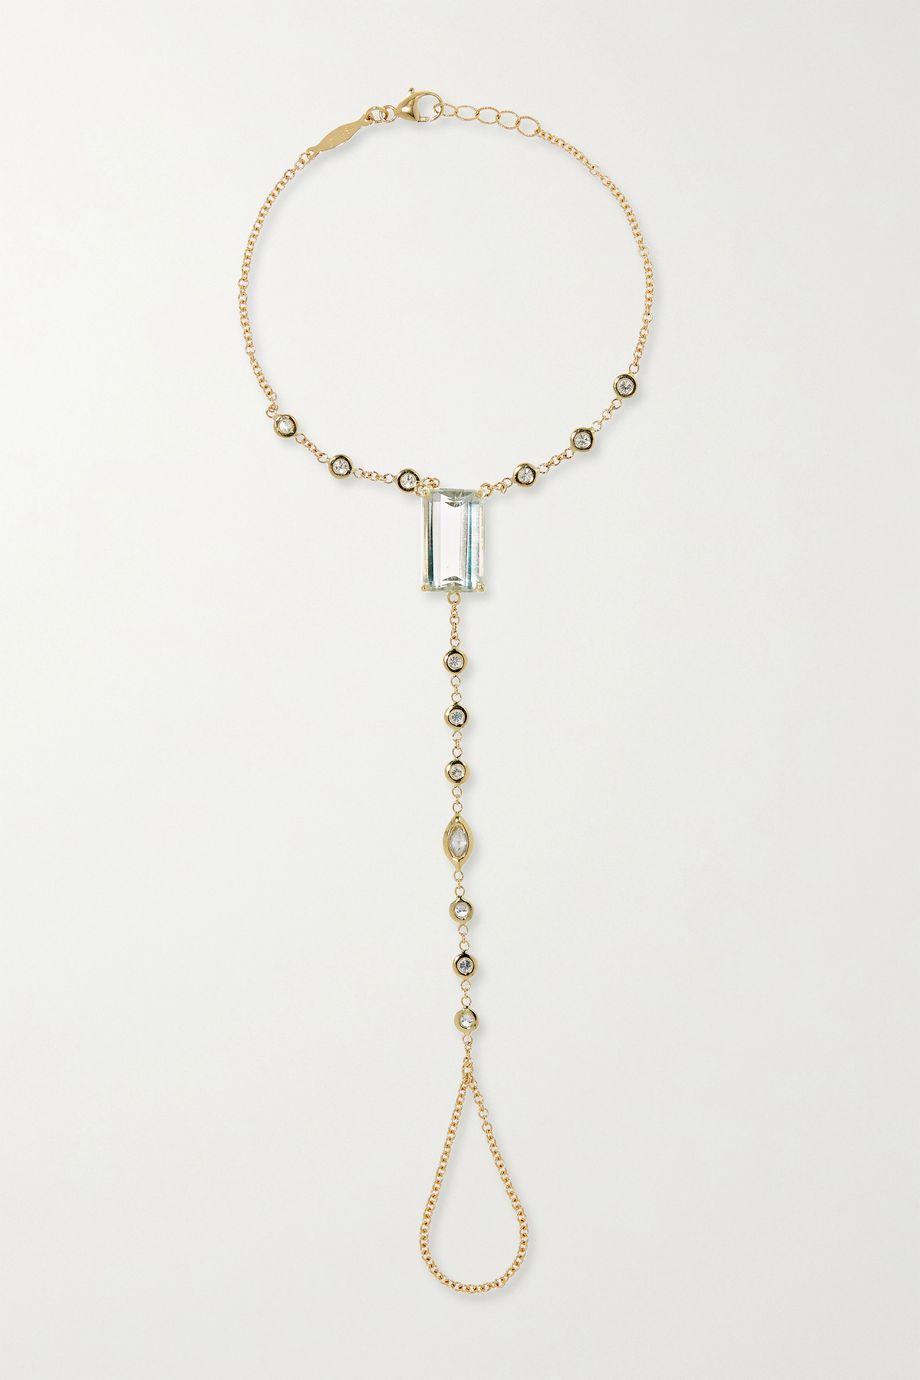 Jacquie Aiche 14-karat gold aquamarine and diamond finger bracelet